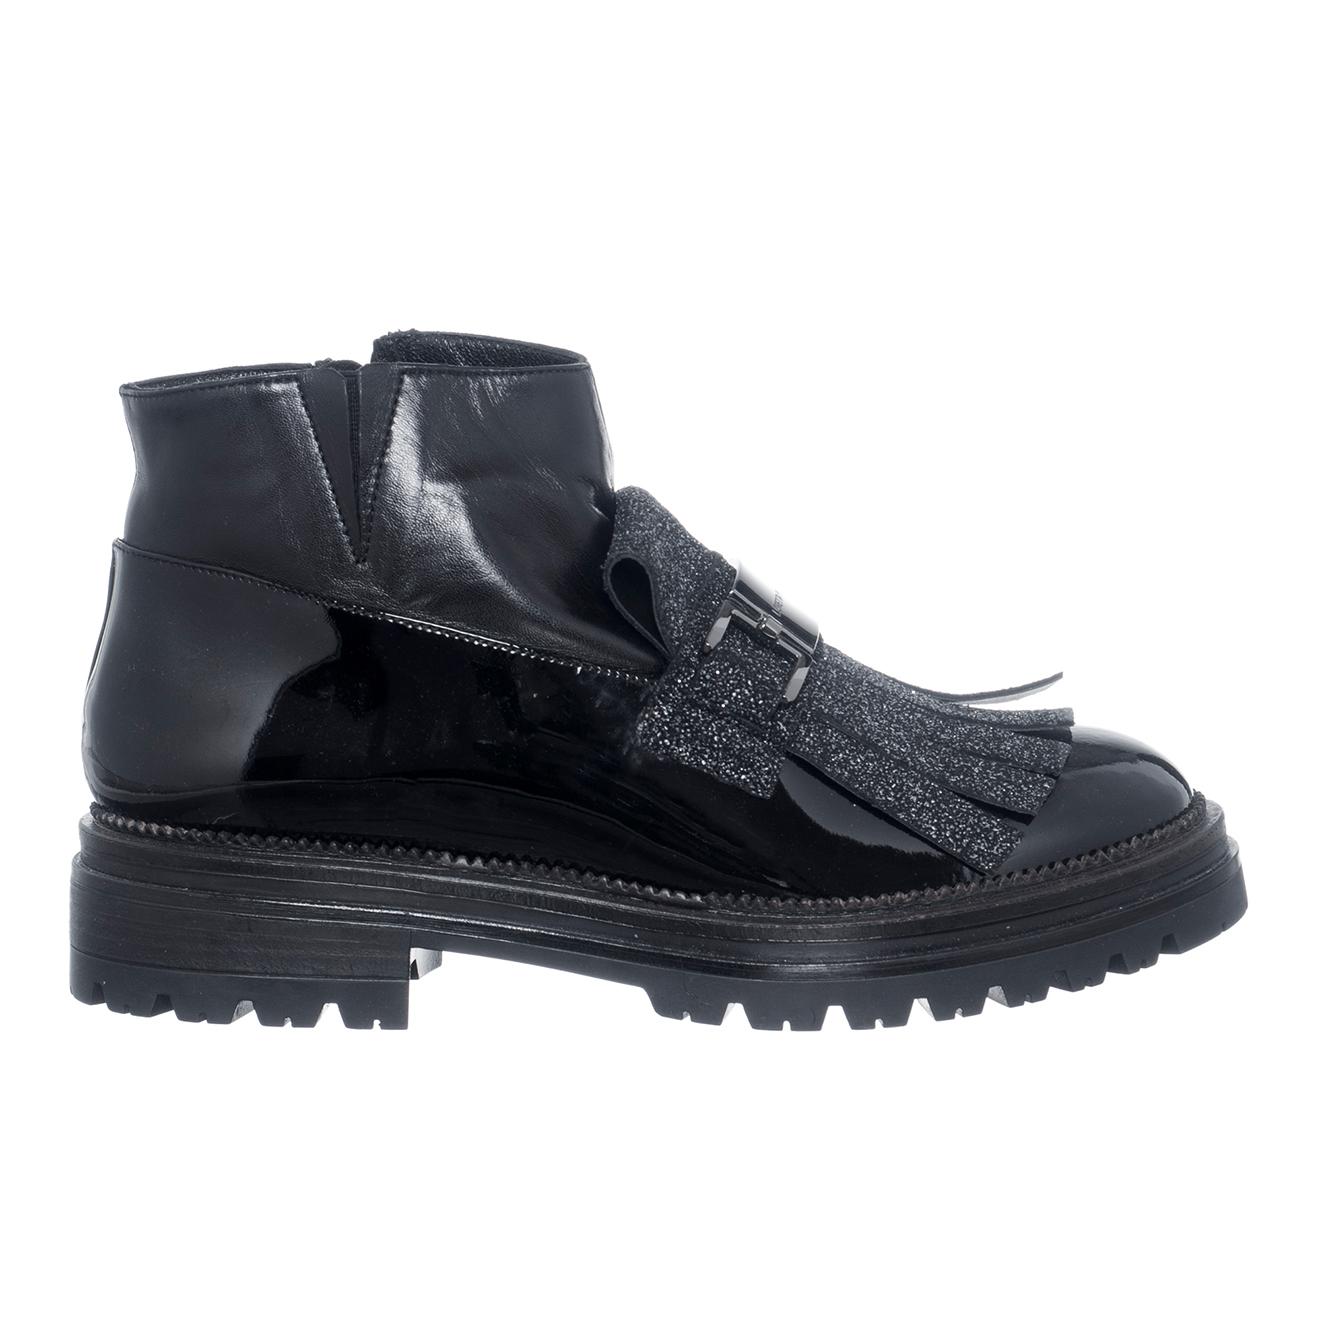 Boots en Cuir Montone noires - Loretta Pettinari - Modalova